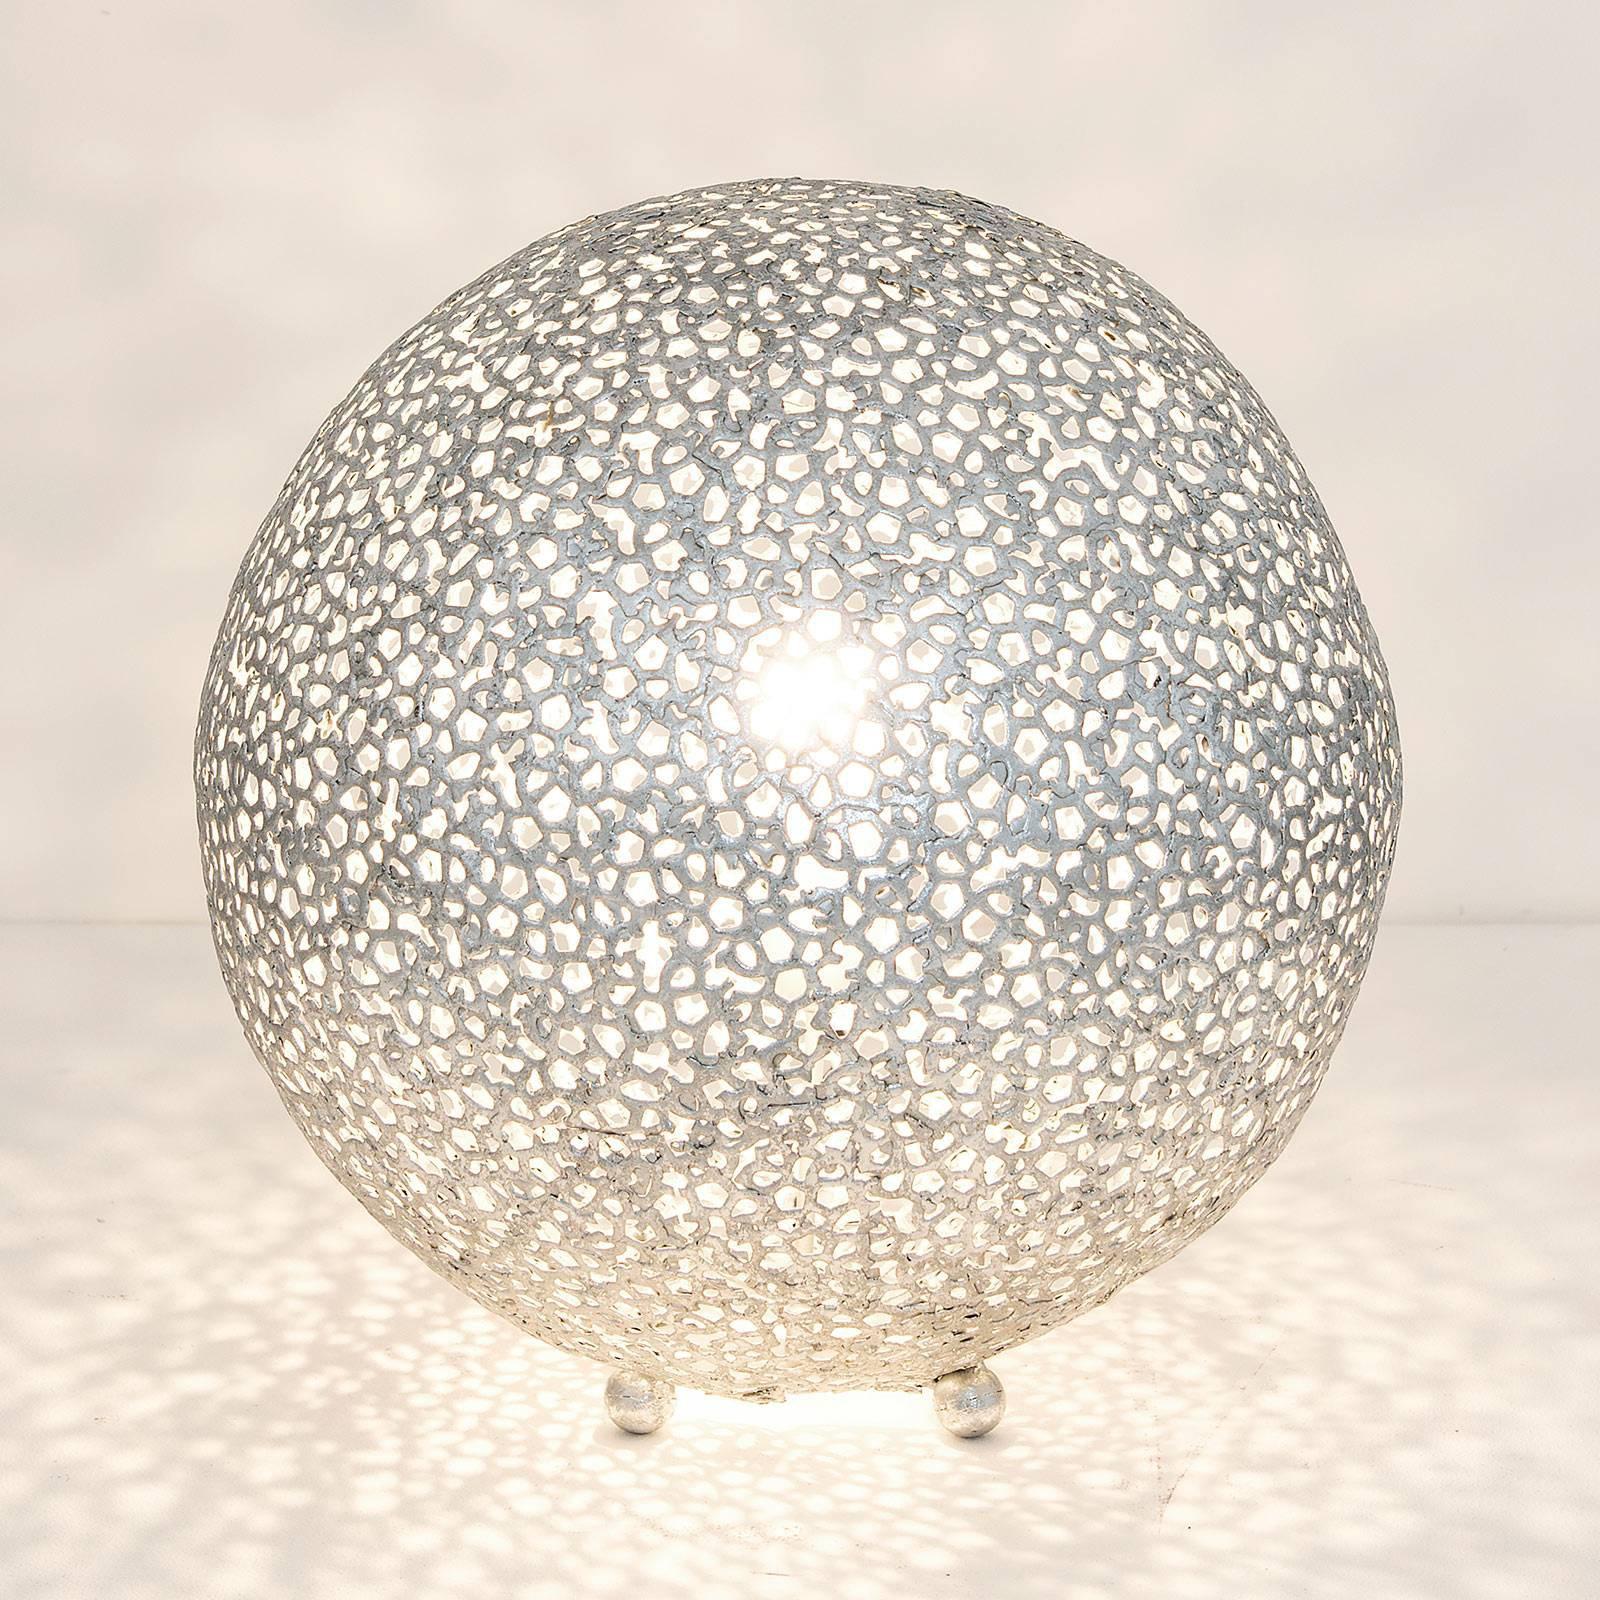 Bordlampe Lily Grande, Ø 43 cm, sølv